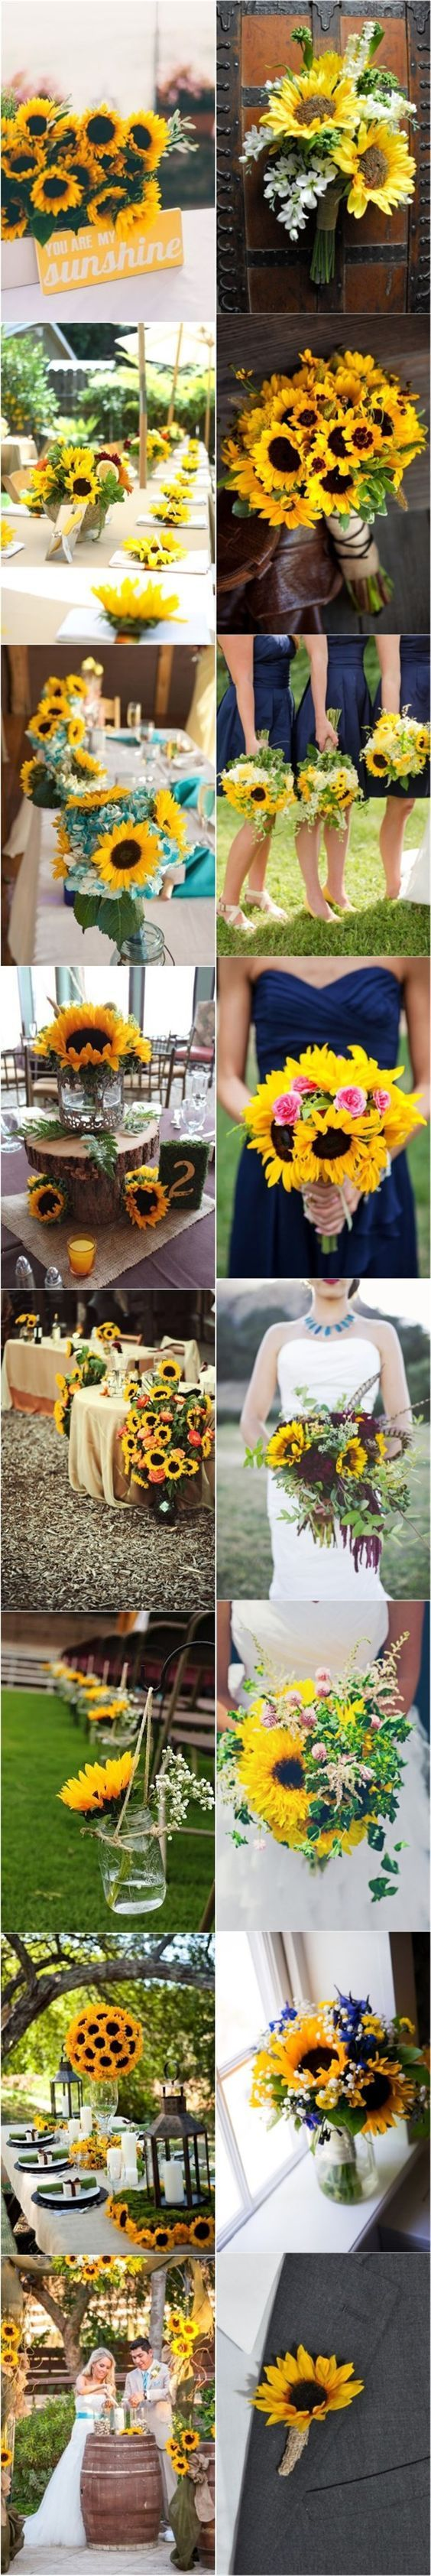 best Wedding Ideas images on Pinterest Sunflowers Wedding